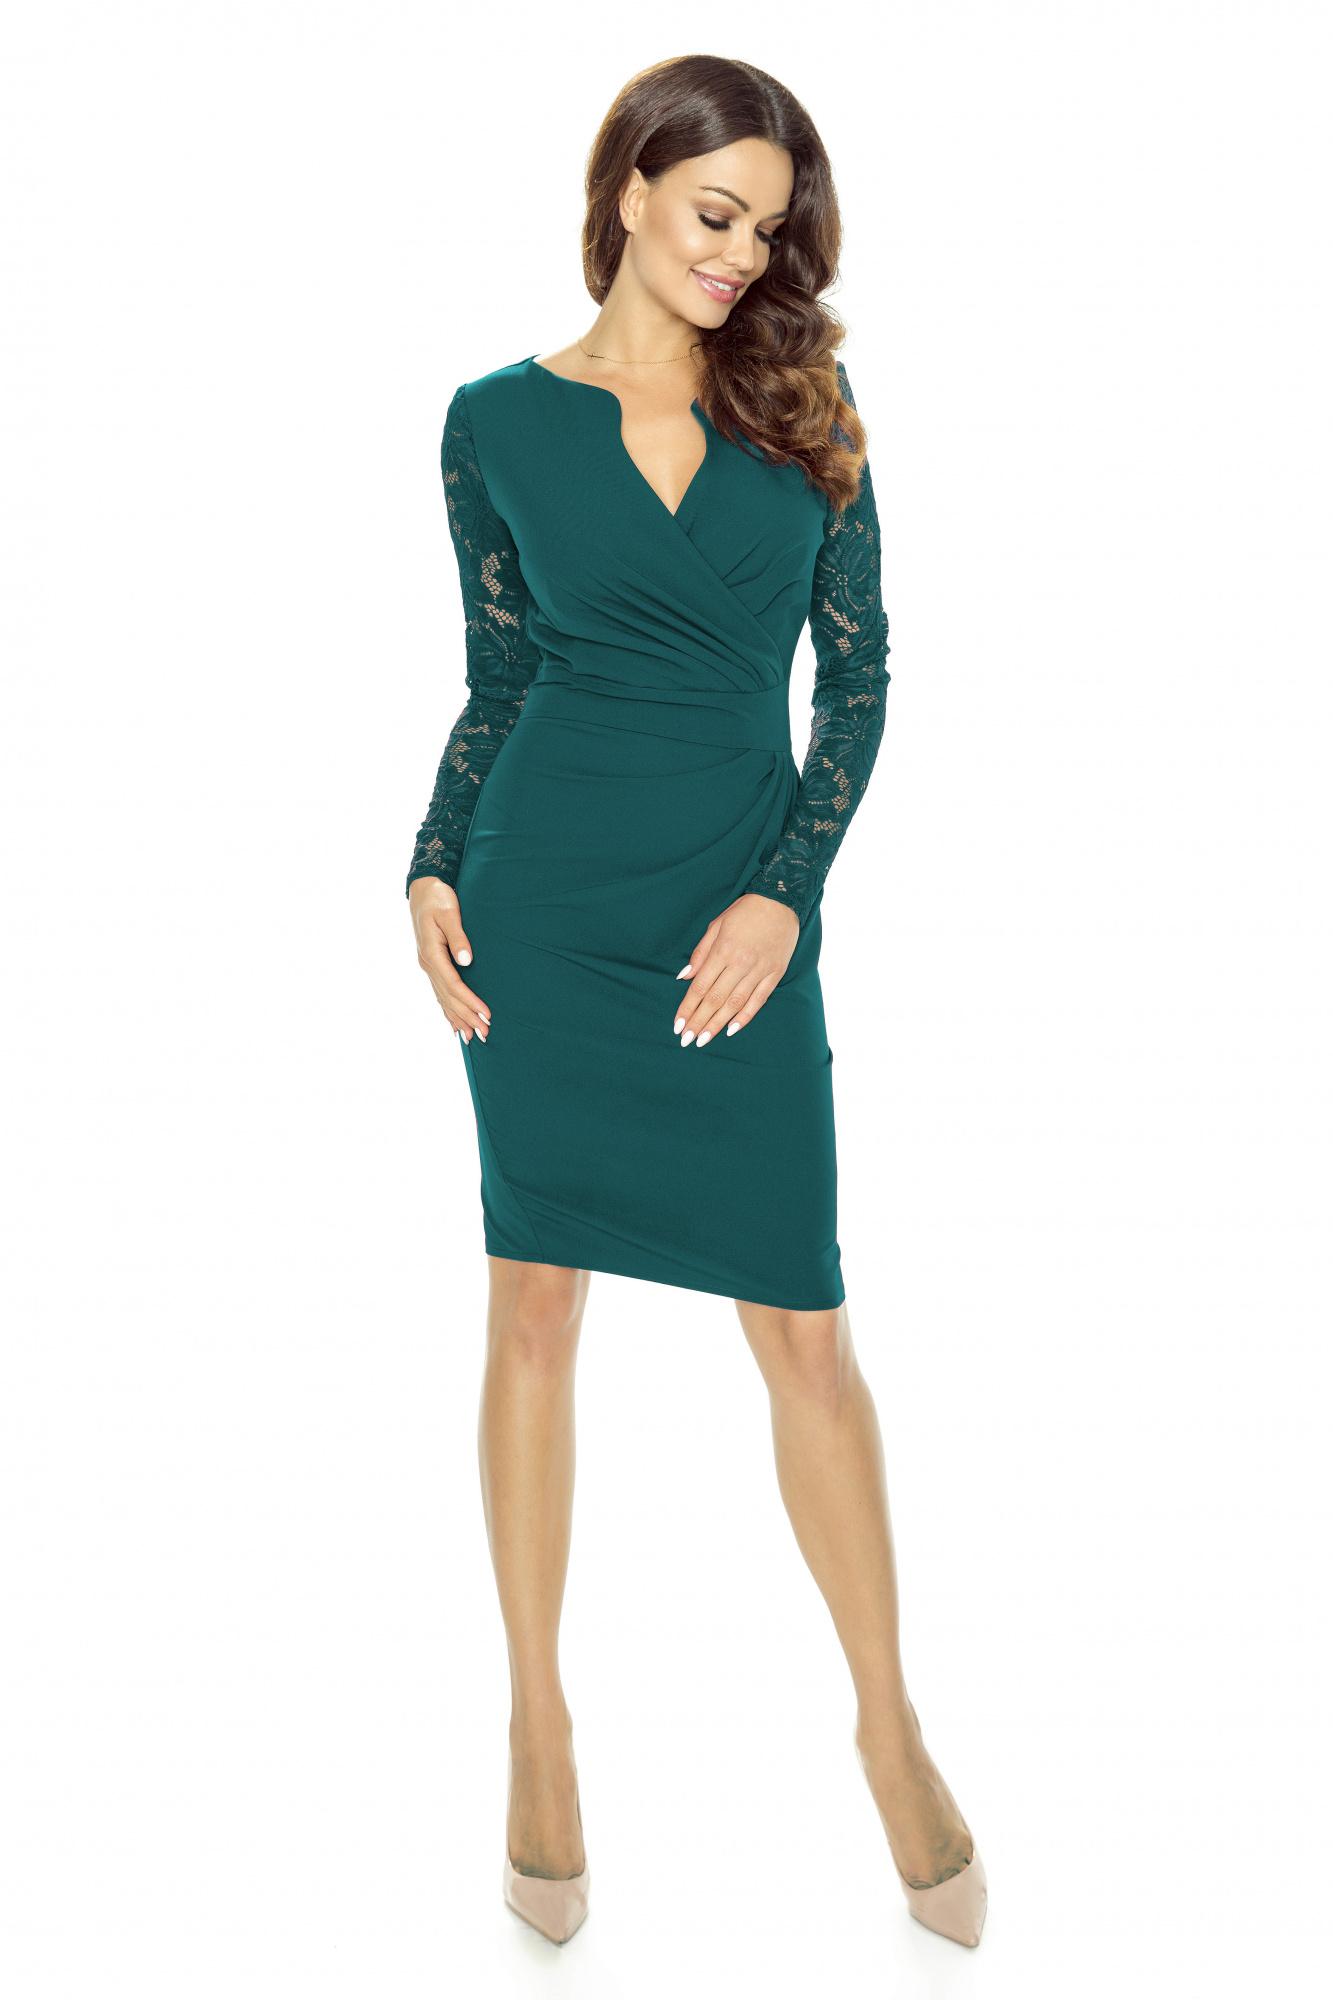 KARTES Dámské šaty Andalusie zelené - Glami.cz f22dc2d15cf